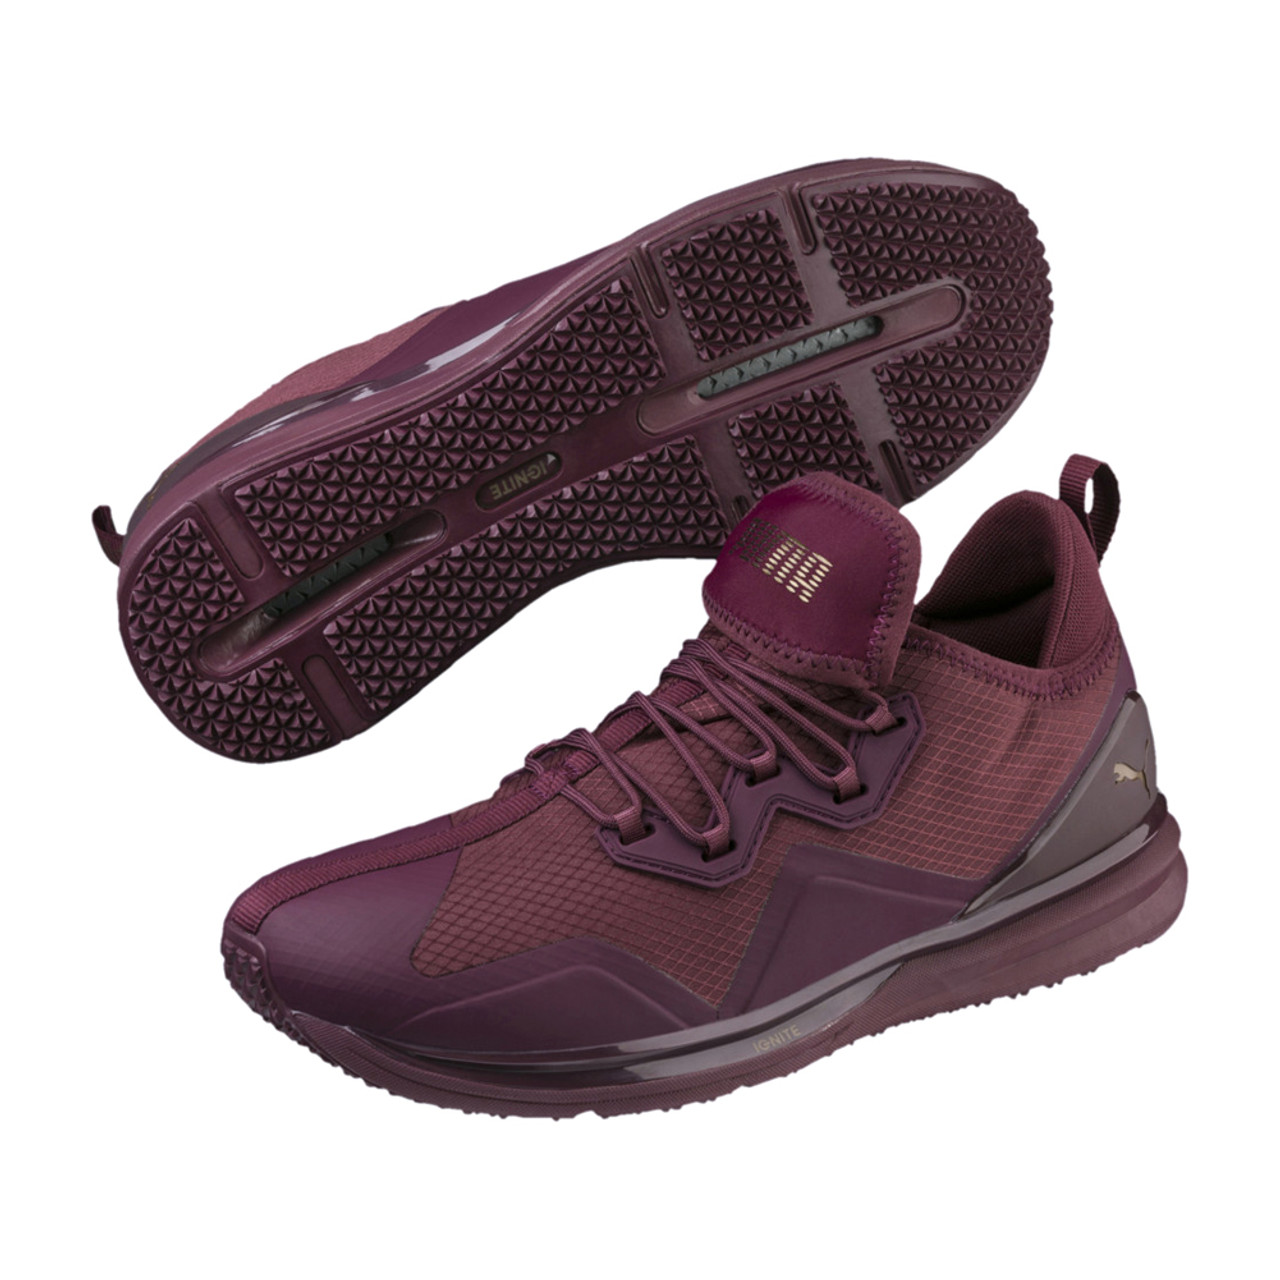 Puma Men s Ignite Limitless Initiate Running Shoe Purple - Shop now    Shoolu.com 03d618a45